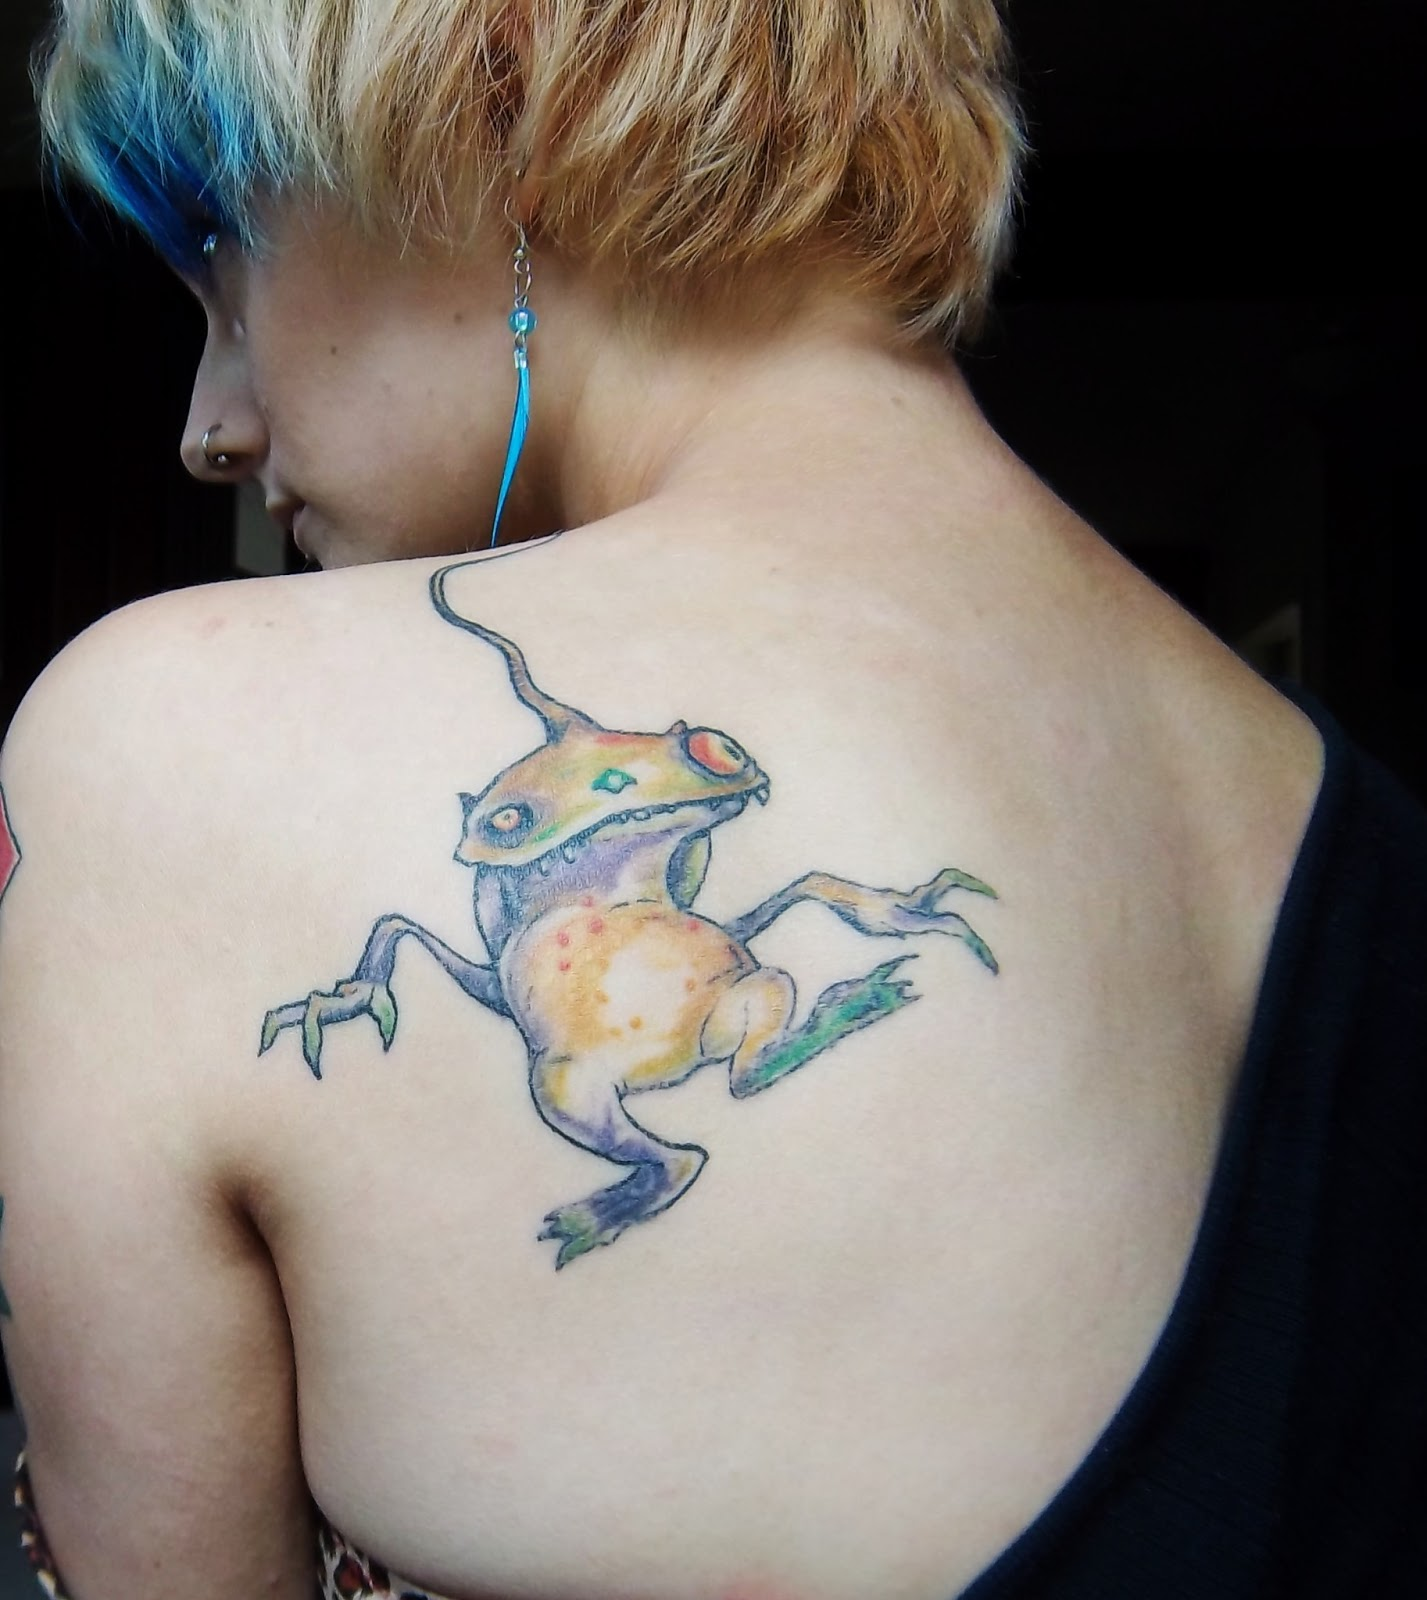 Girl interrupted tattoo